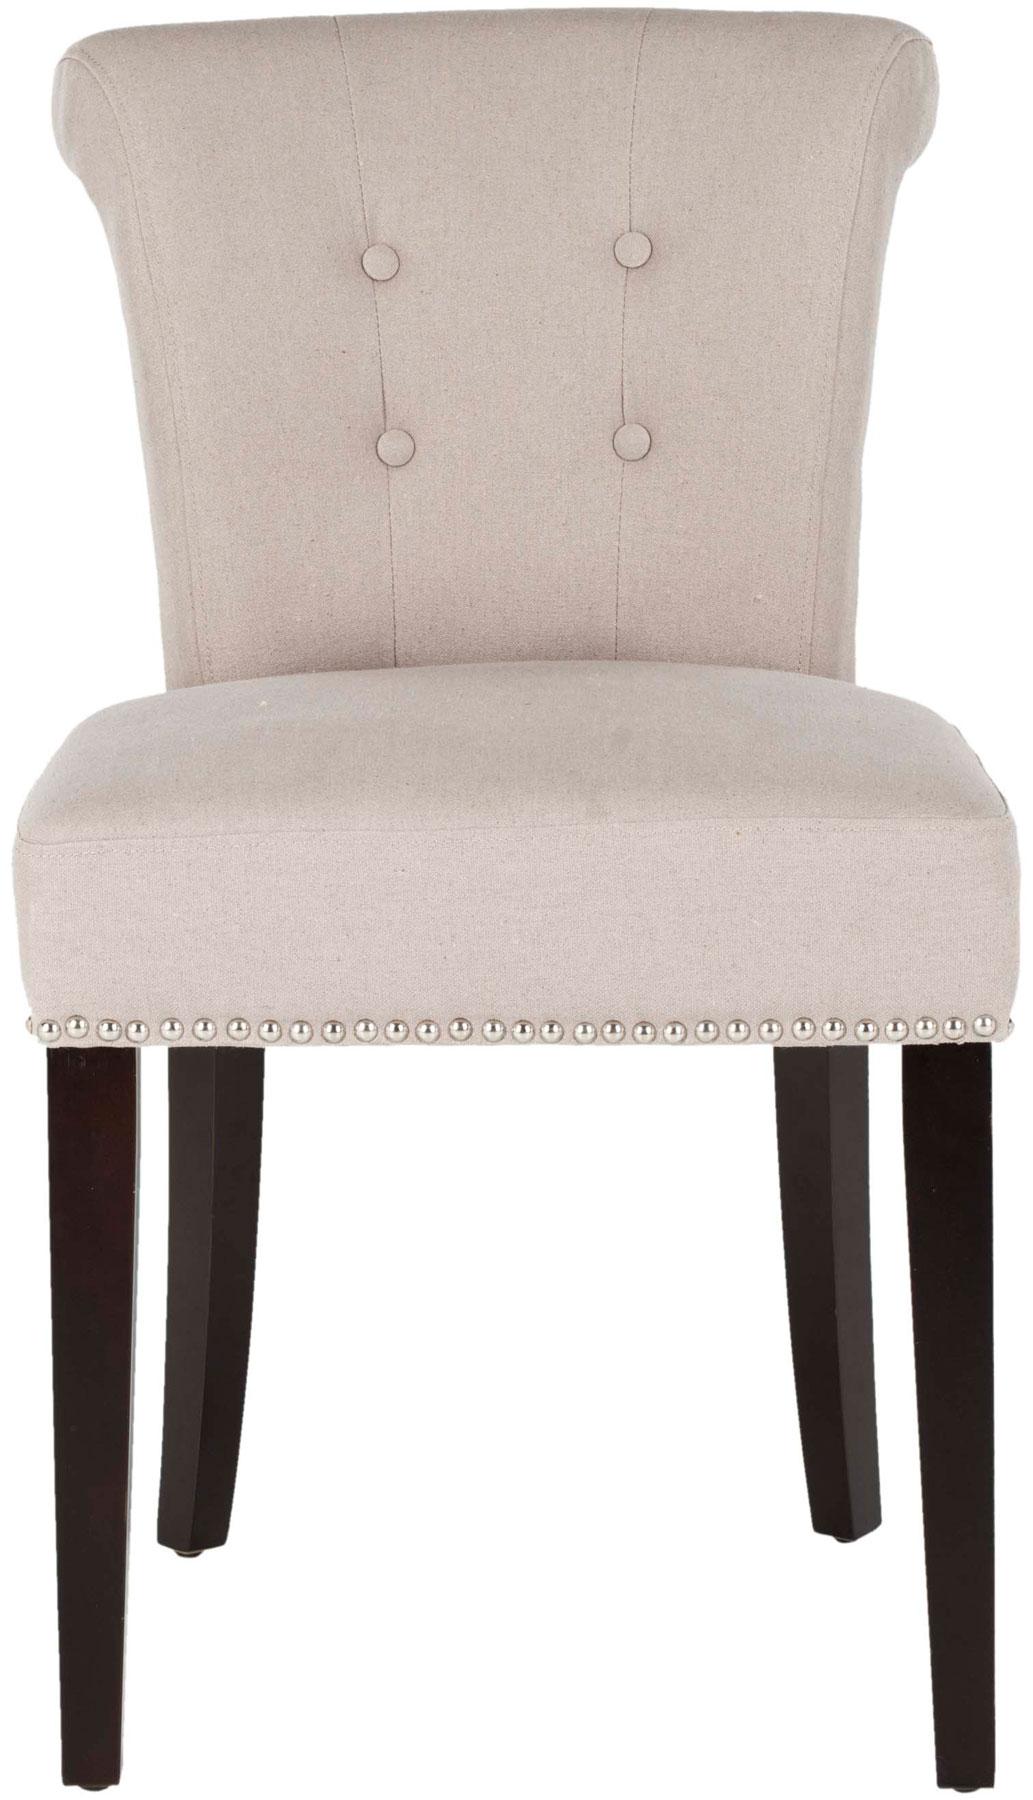 safavieh sinclair ring side chair circle swivel mcr4705b set2 dining chairs furniture by